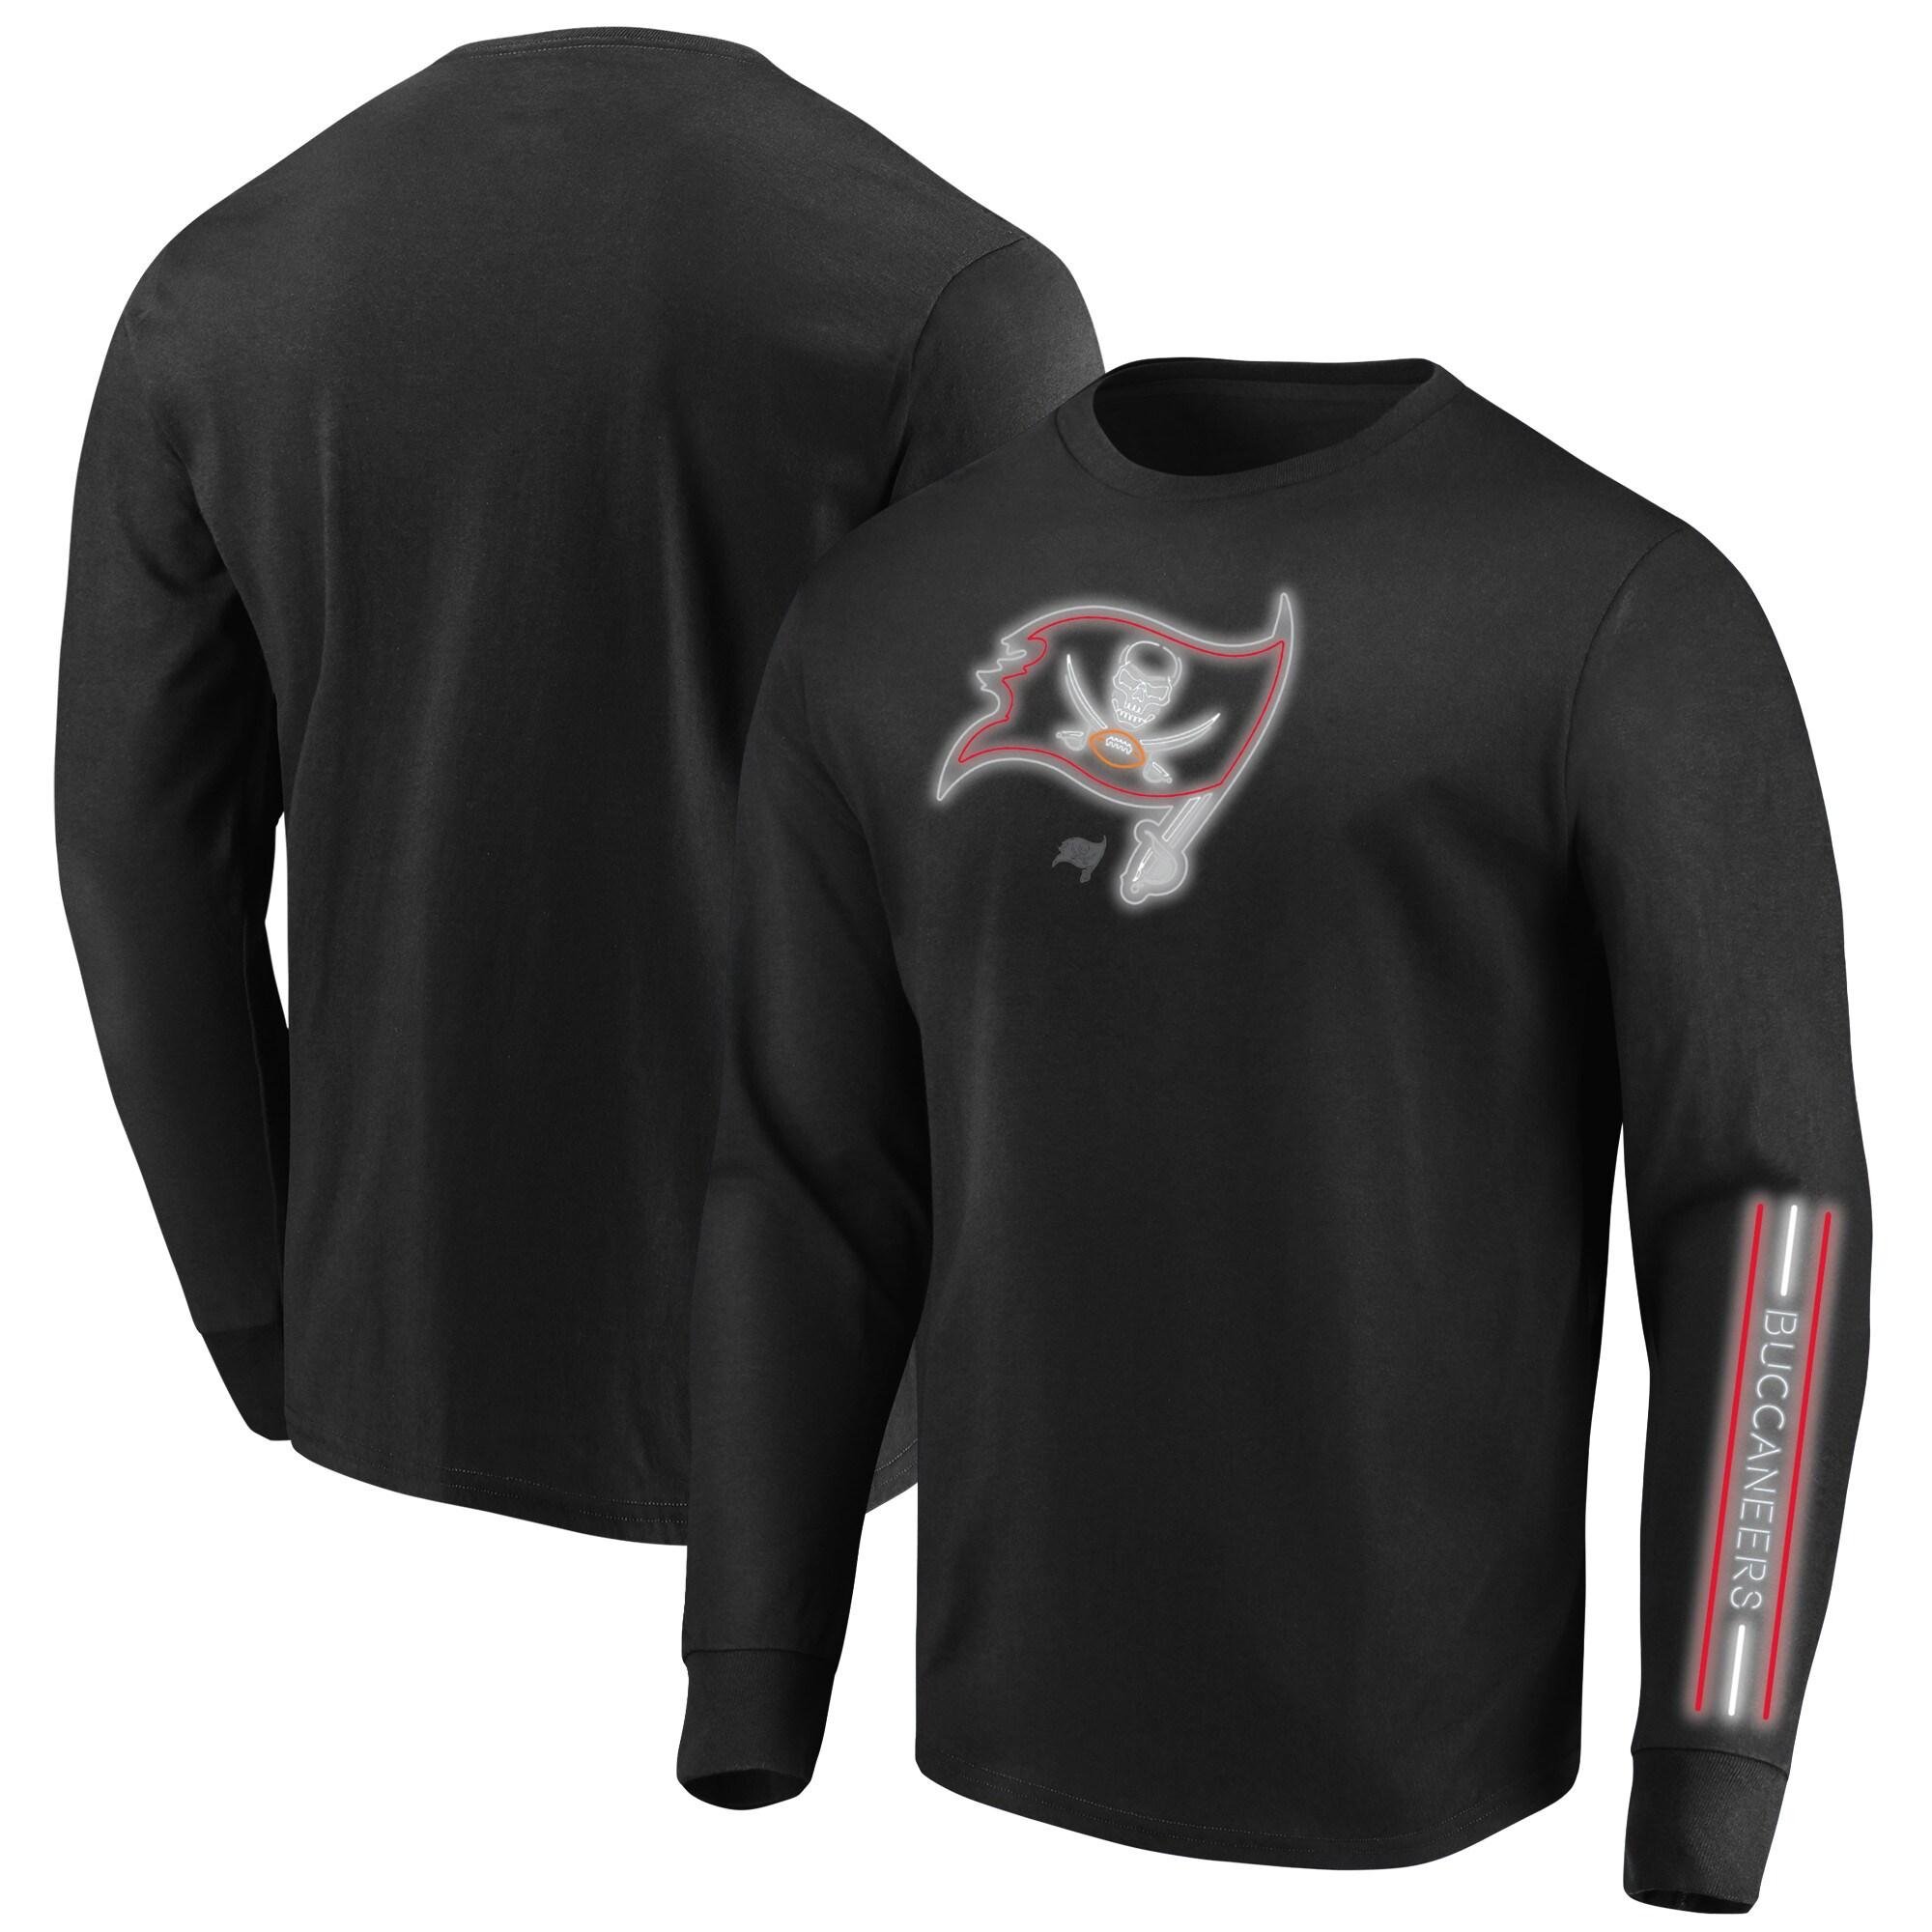 Tampa Bay Buccaneers Majestic Big & Tall Startling Success Long Sleeve T-Shirt - Black